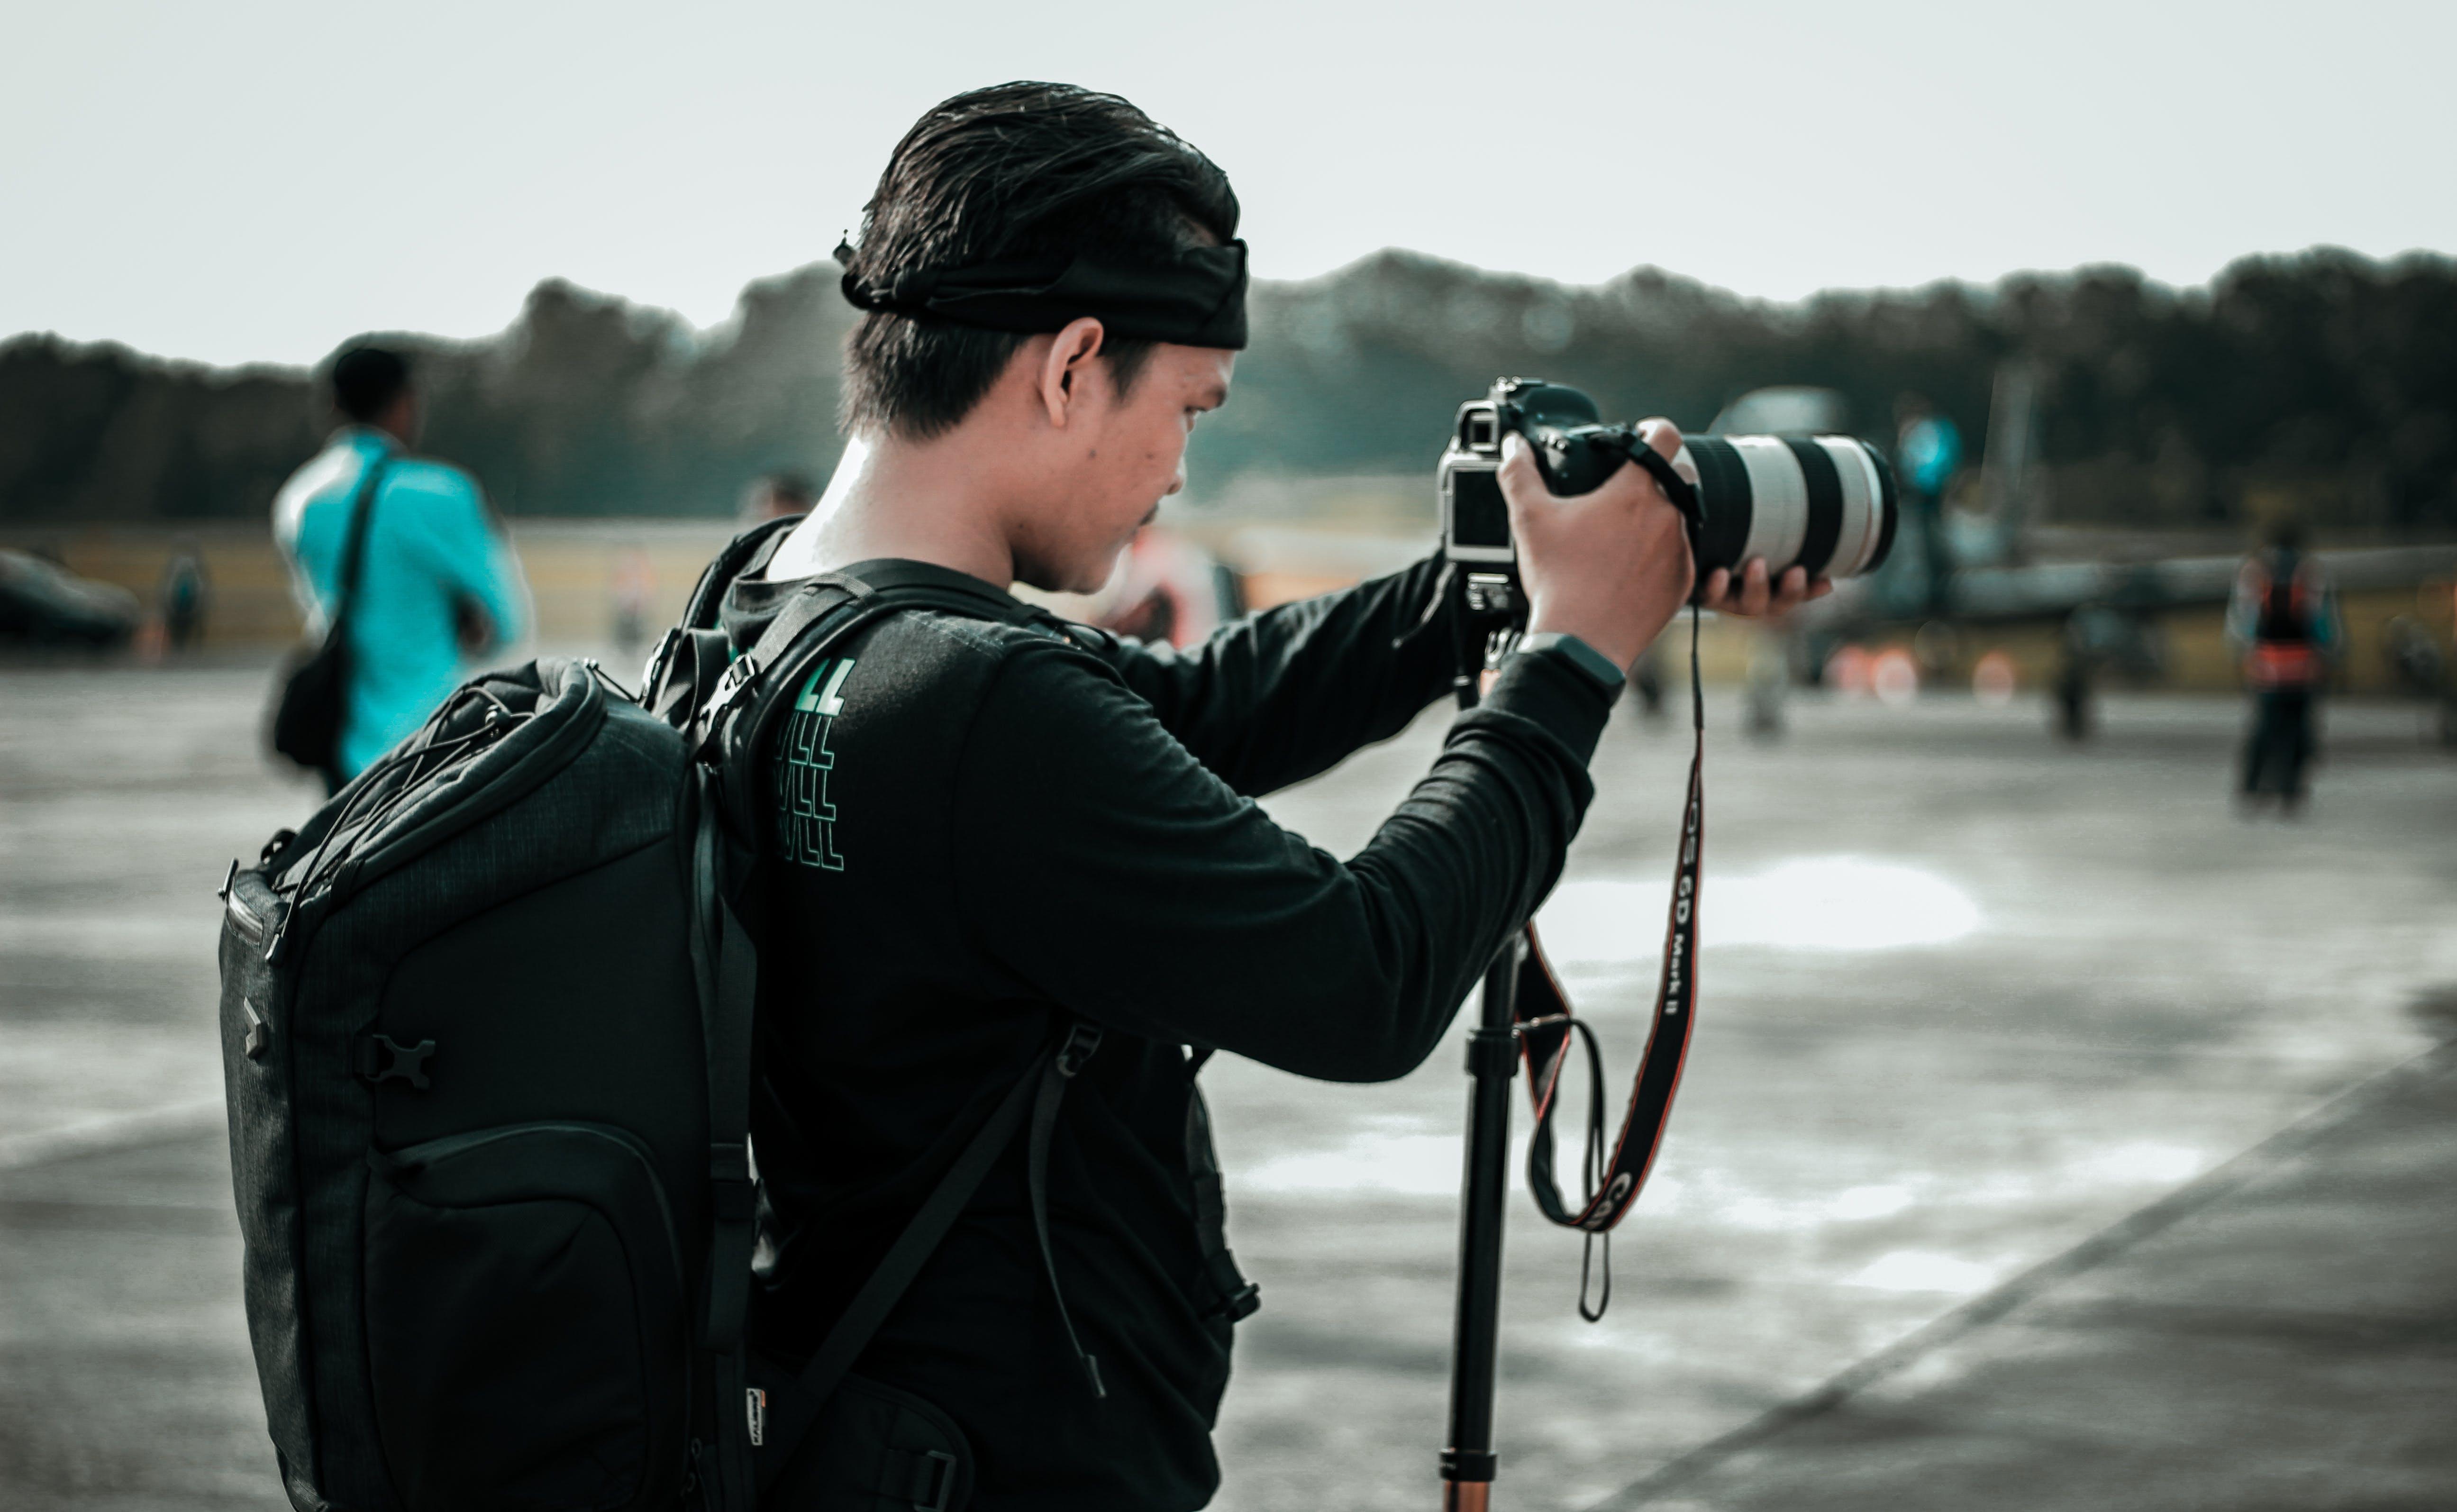 Focus Photography of Man Using Dslr Camera